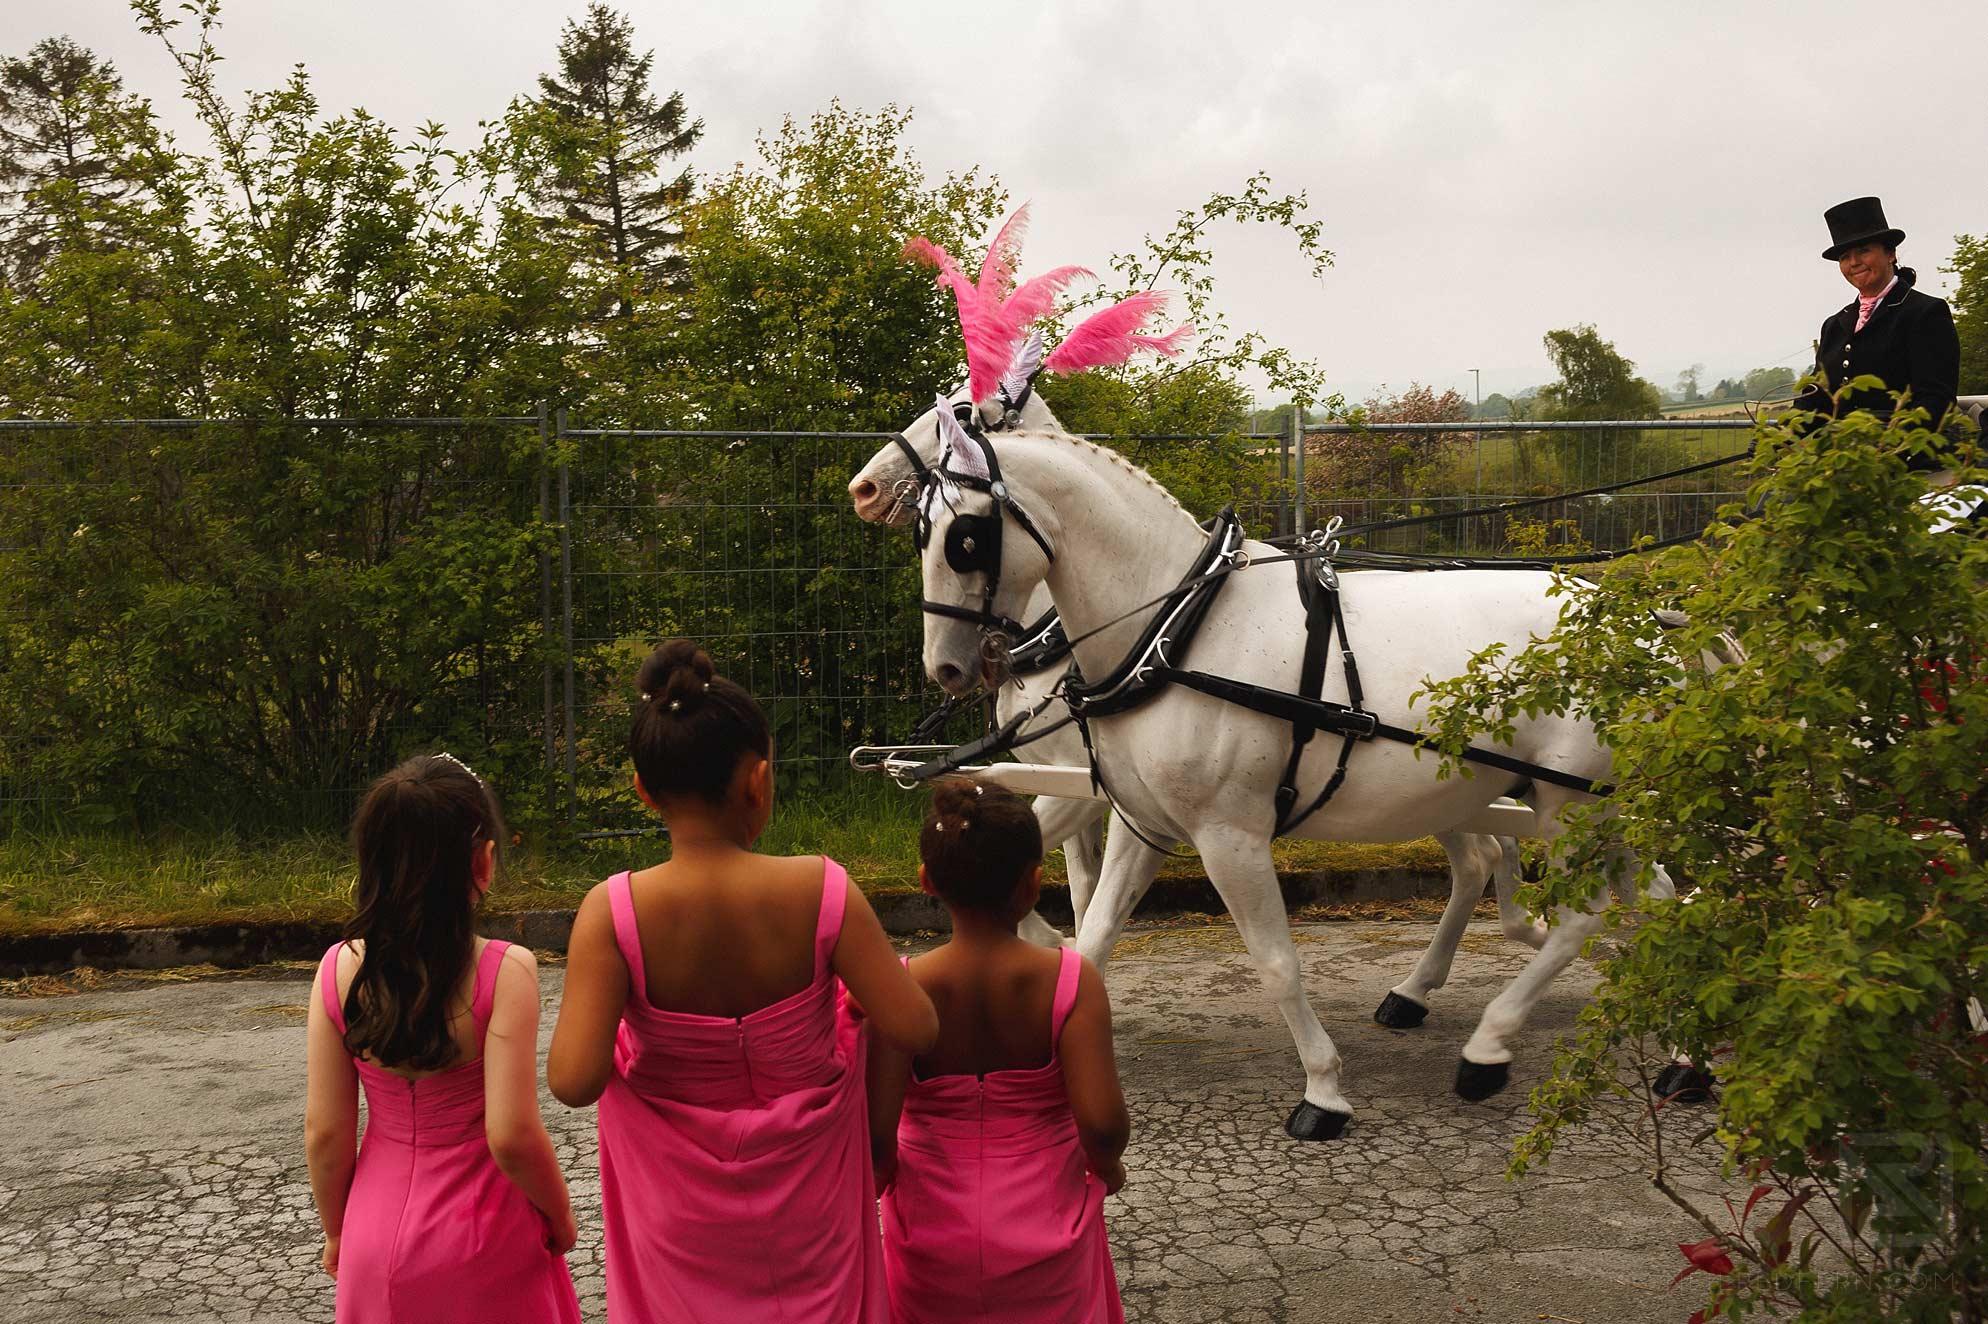 Metropole-Hotel-Llandrindod-Wells-wedding-12